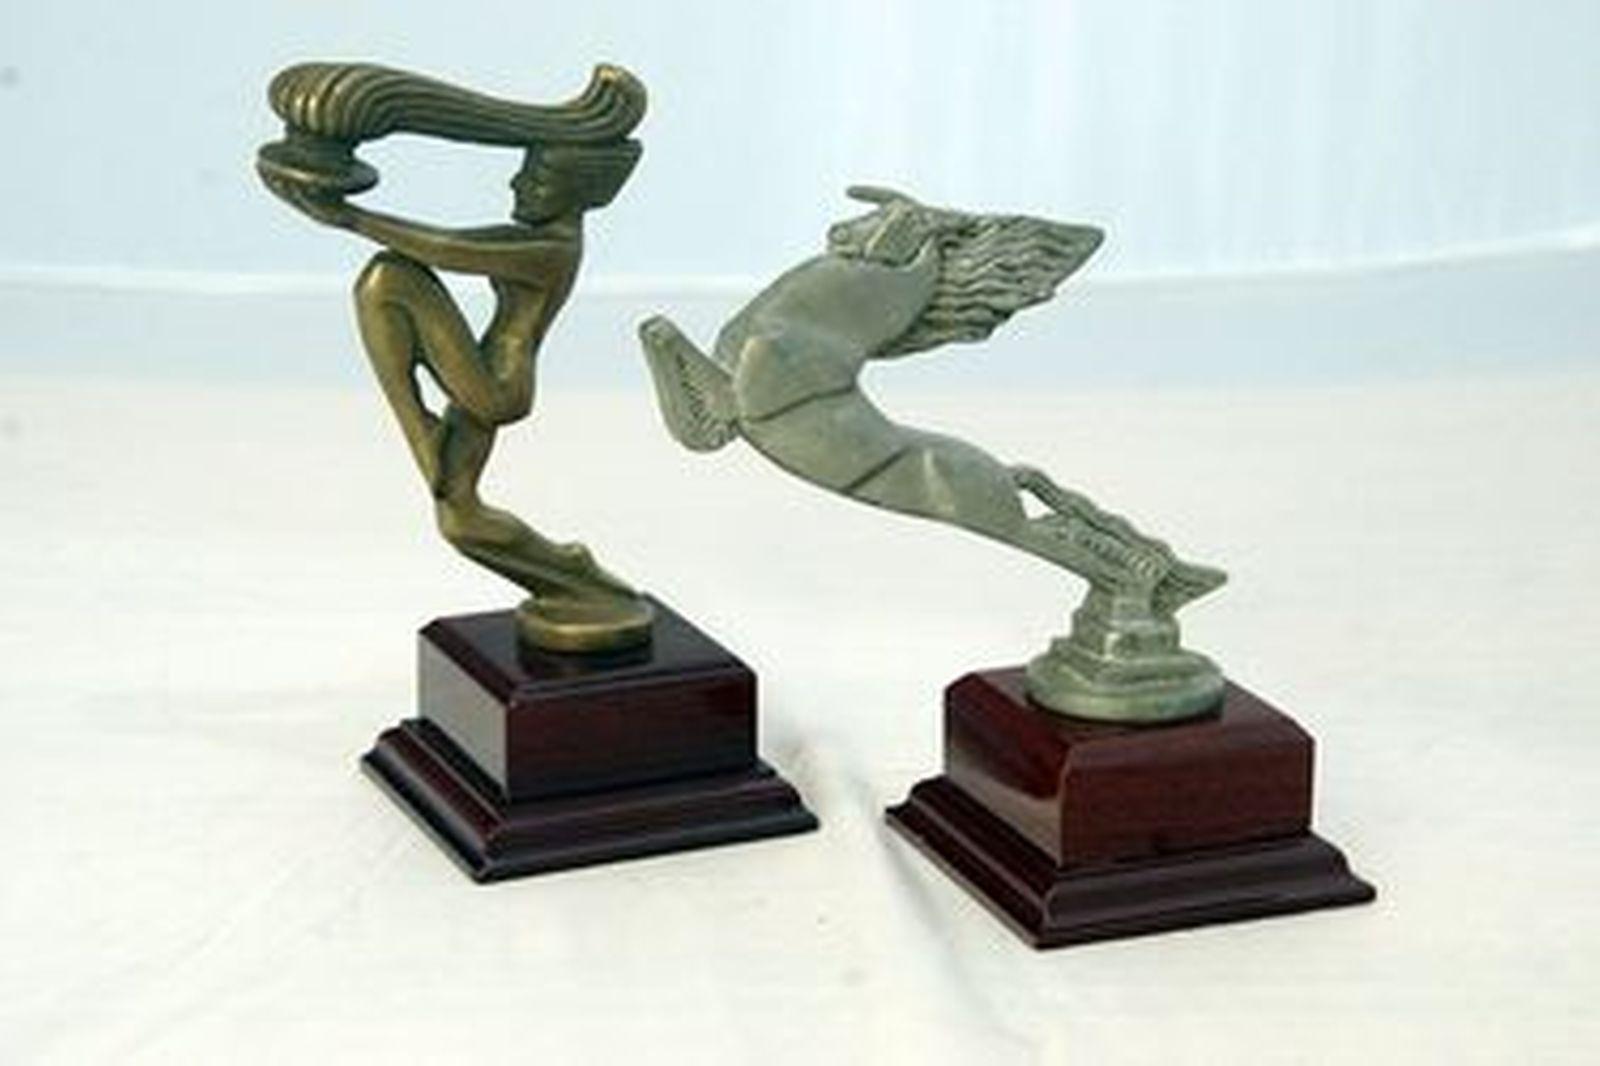 Car Mascots - Art Deco Bazin style Unicorn Mascot (13cm Tall) & Flame Torch Mascot (16cm Tall)